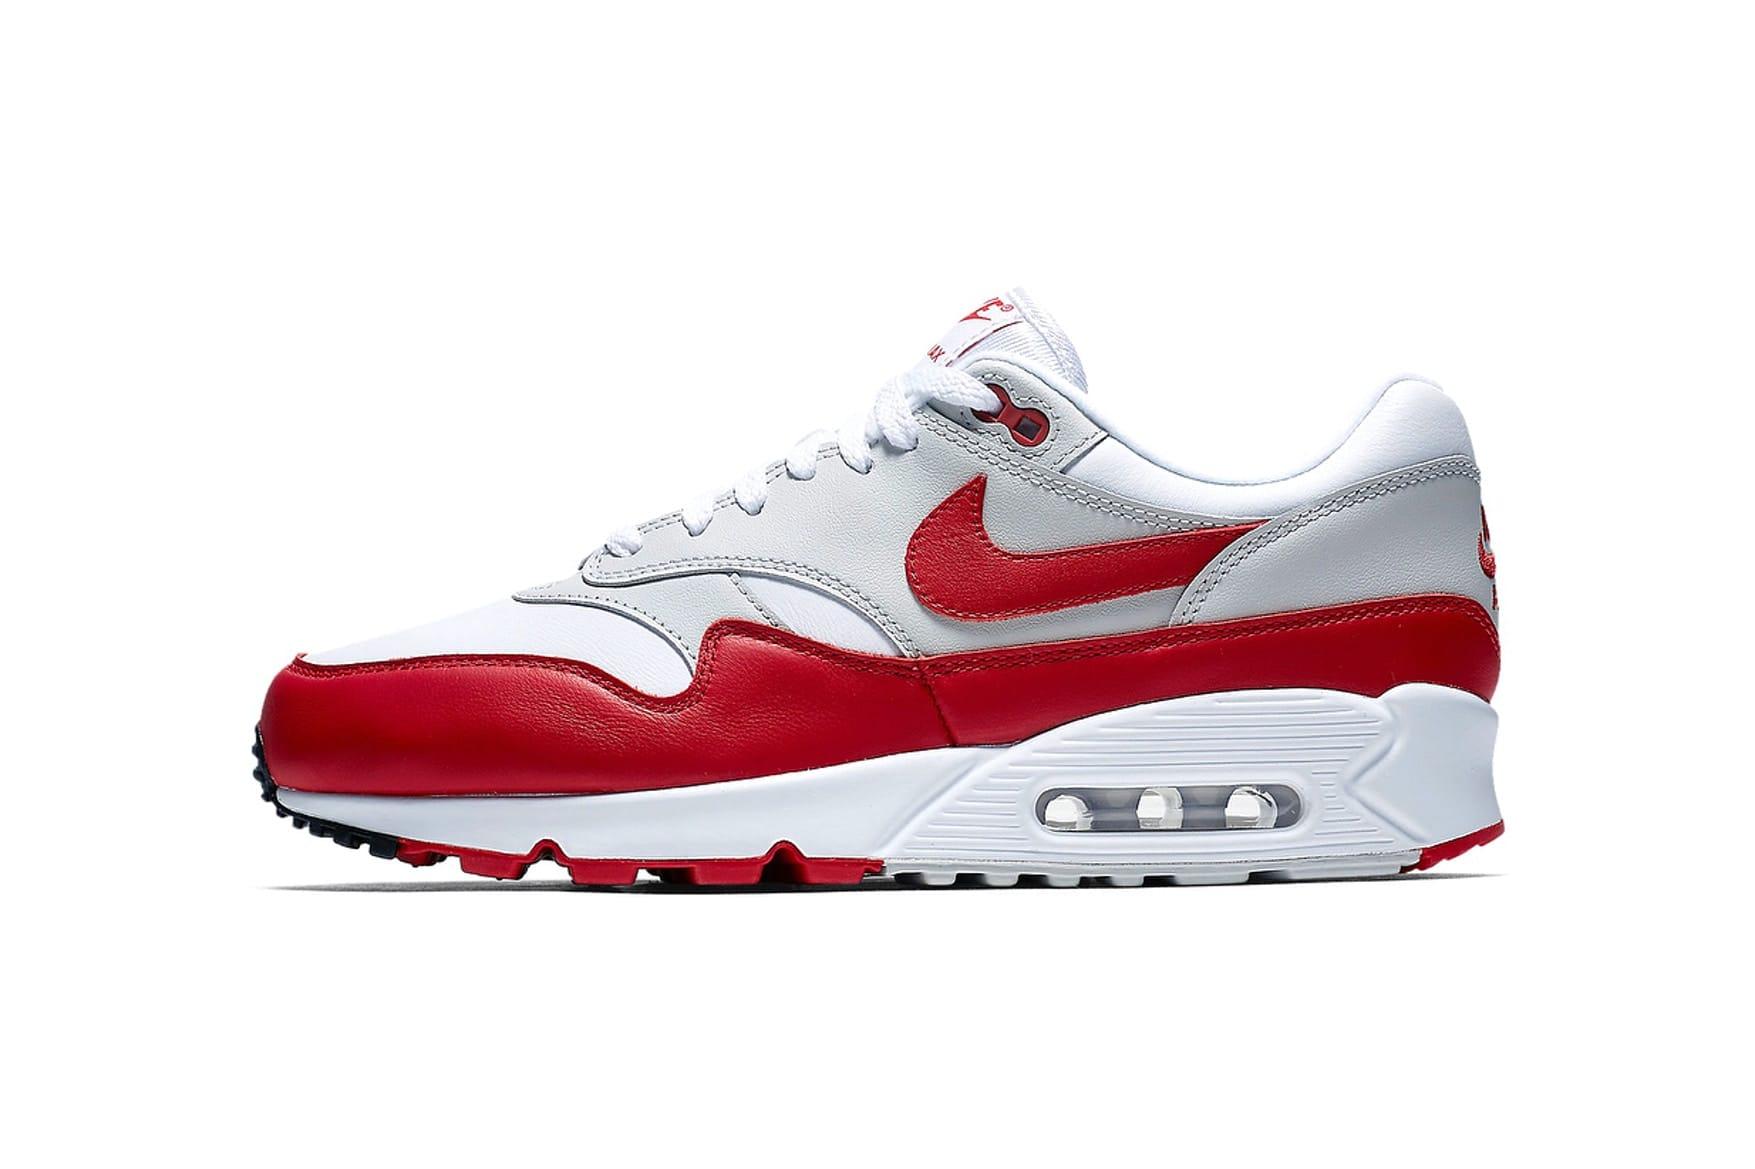 air max 90 rouge et blanche